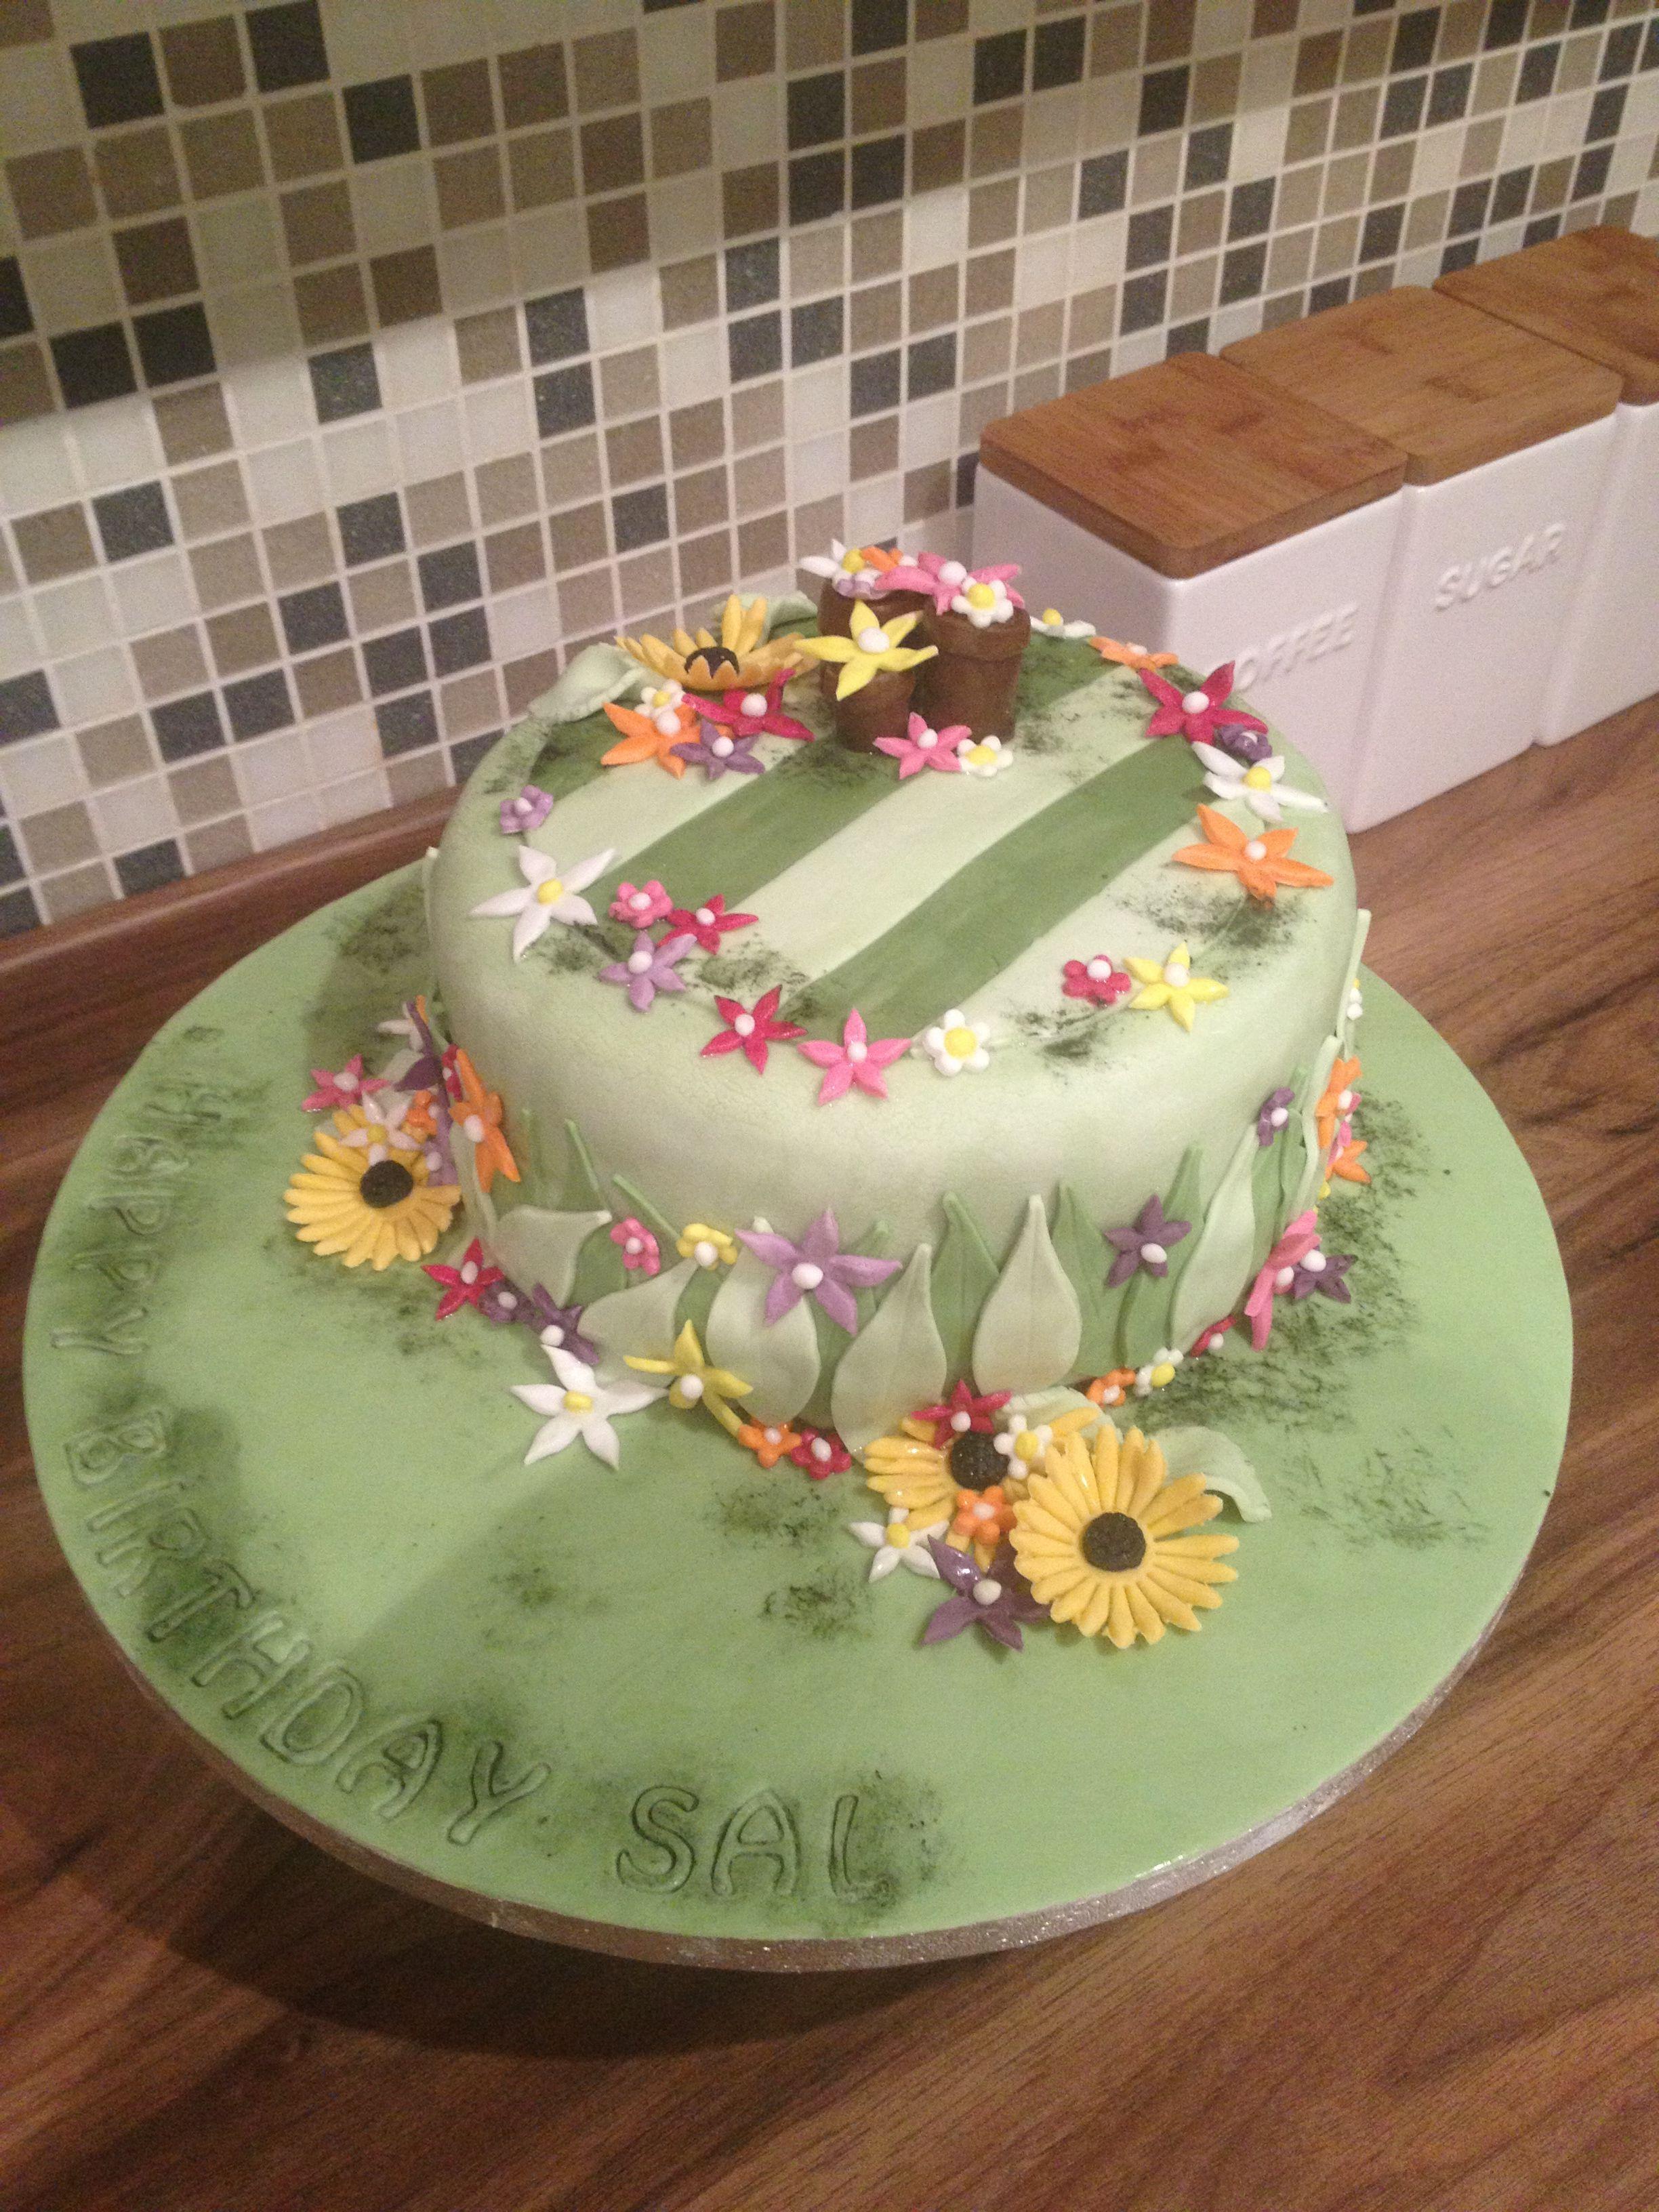 Flower garden birthday cake kerrys homemade cakes pinterest flower garden birthday cake izmirmasajfo